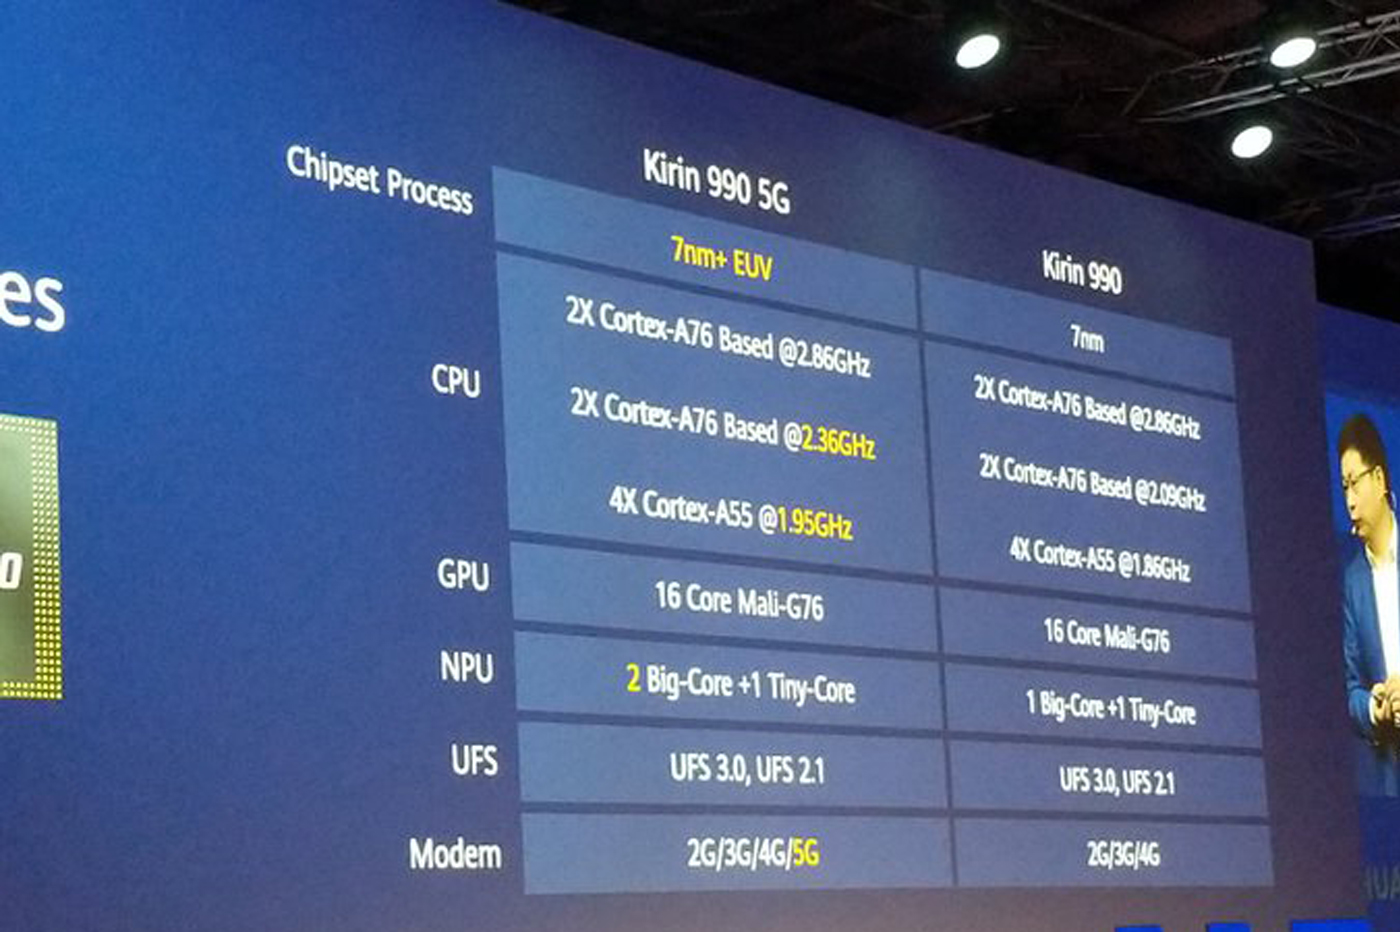 Huawei Kirin 990 5G